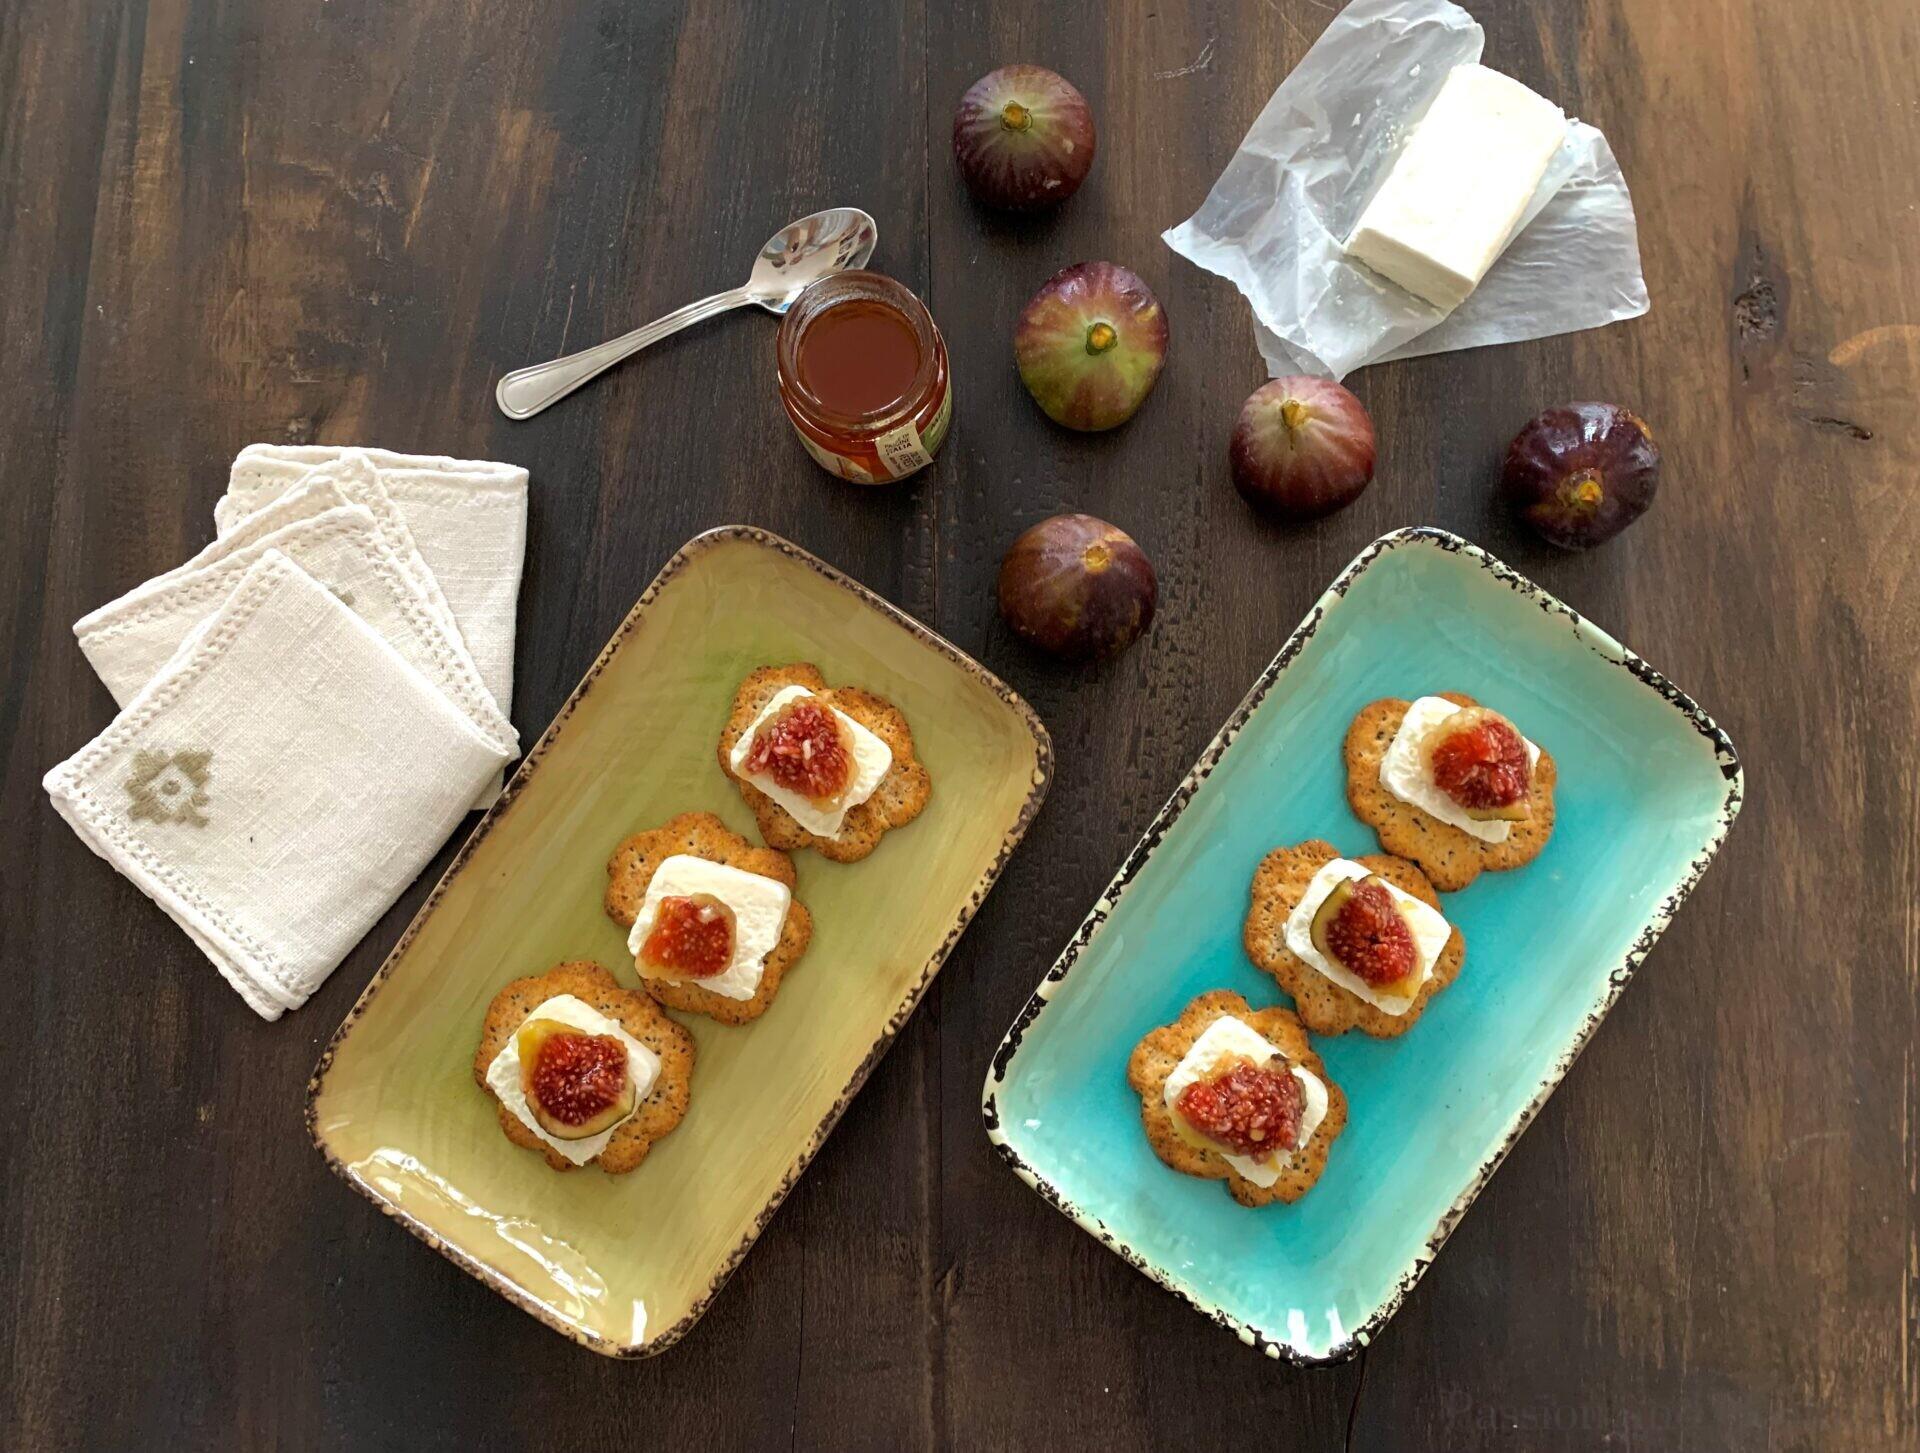 Caprino and figs